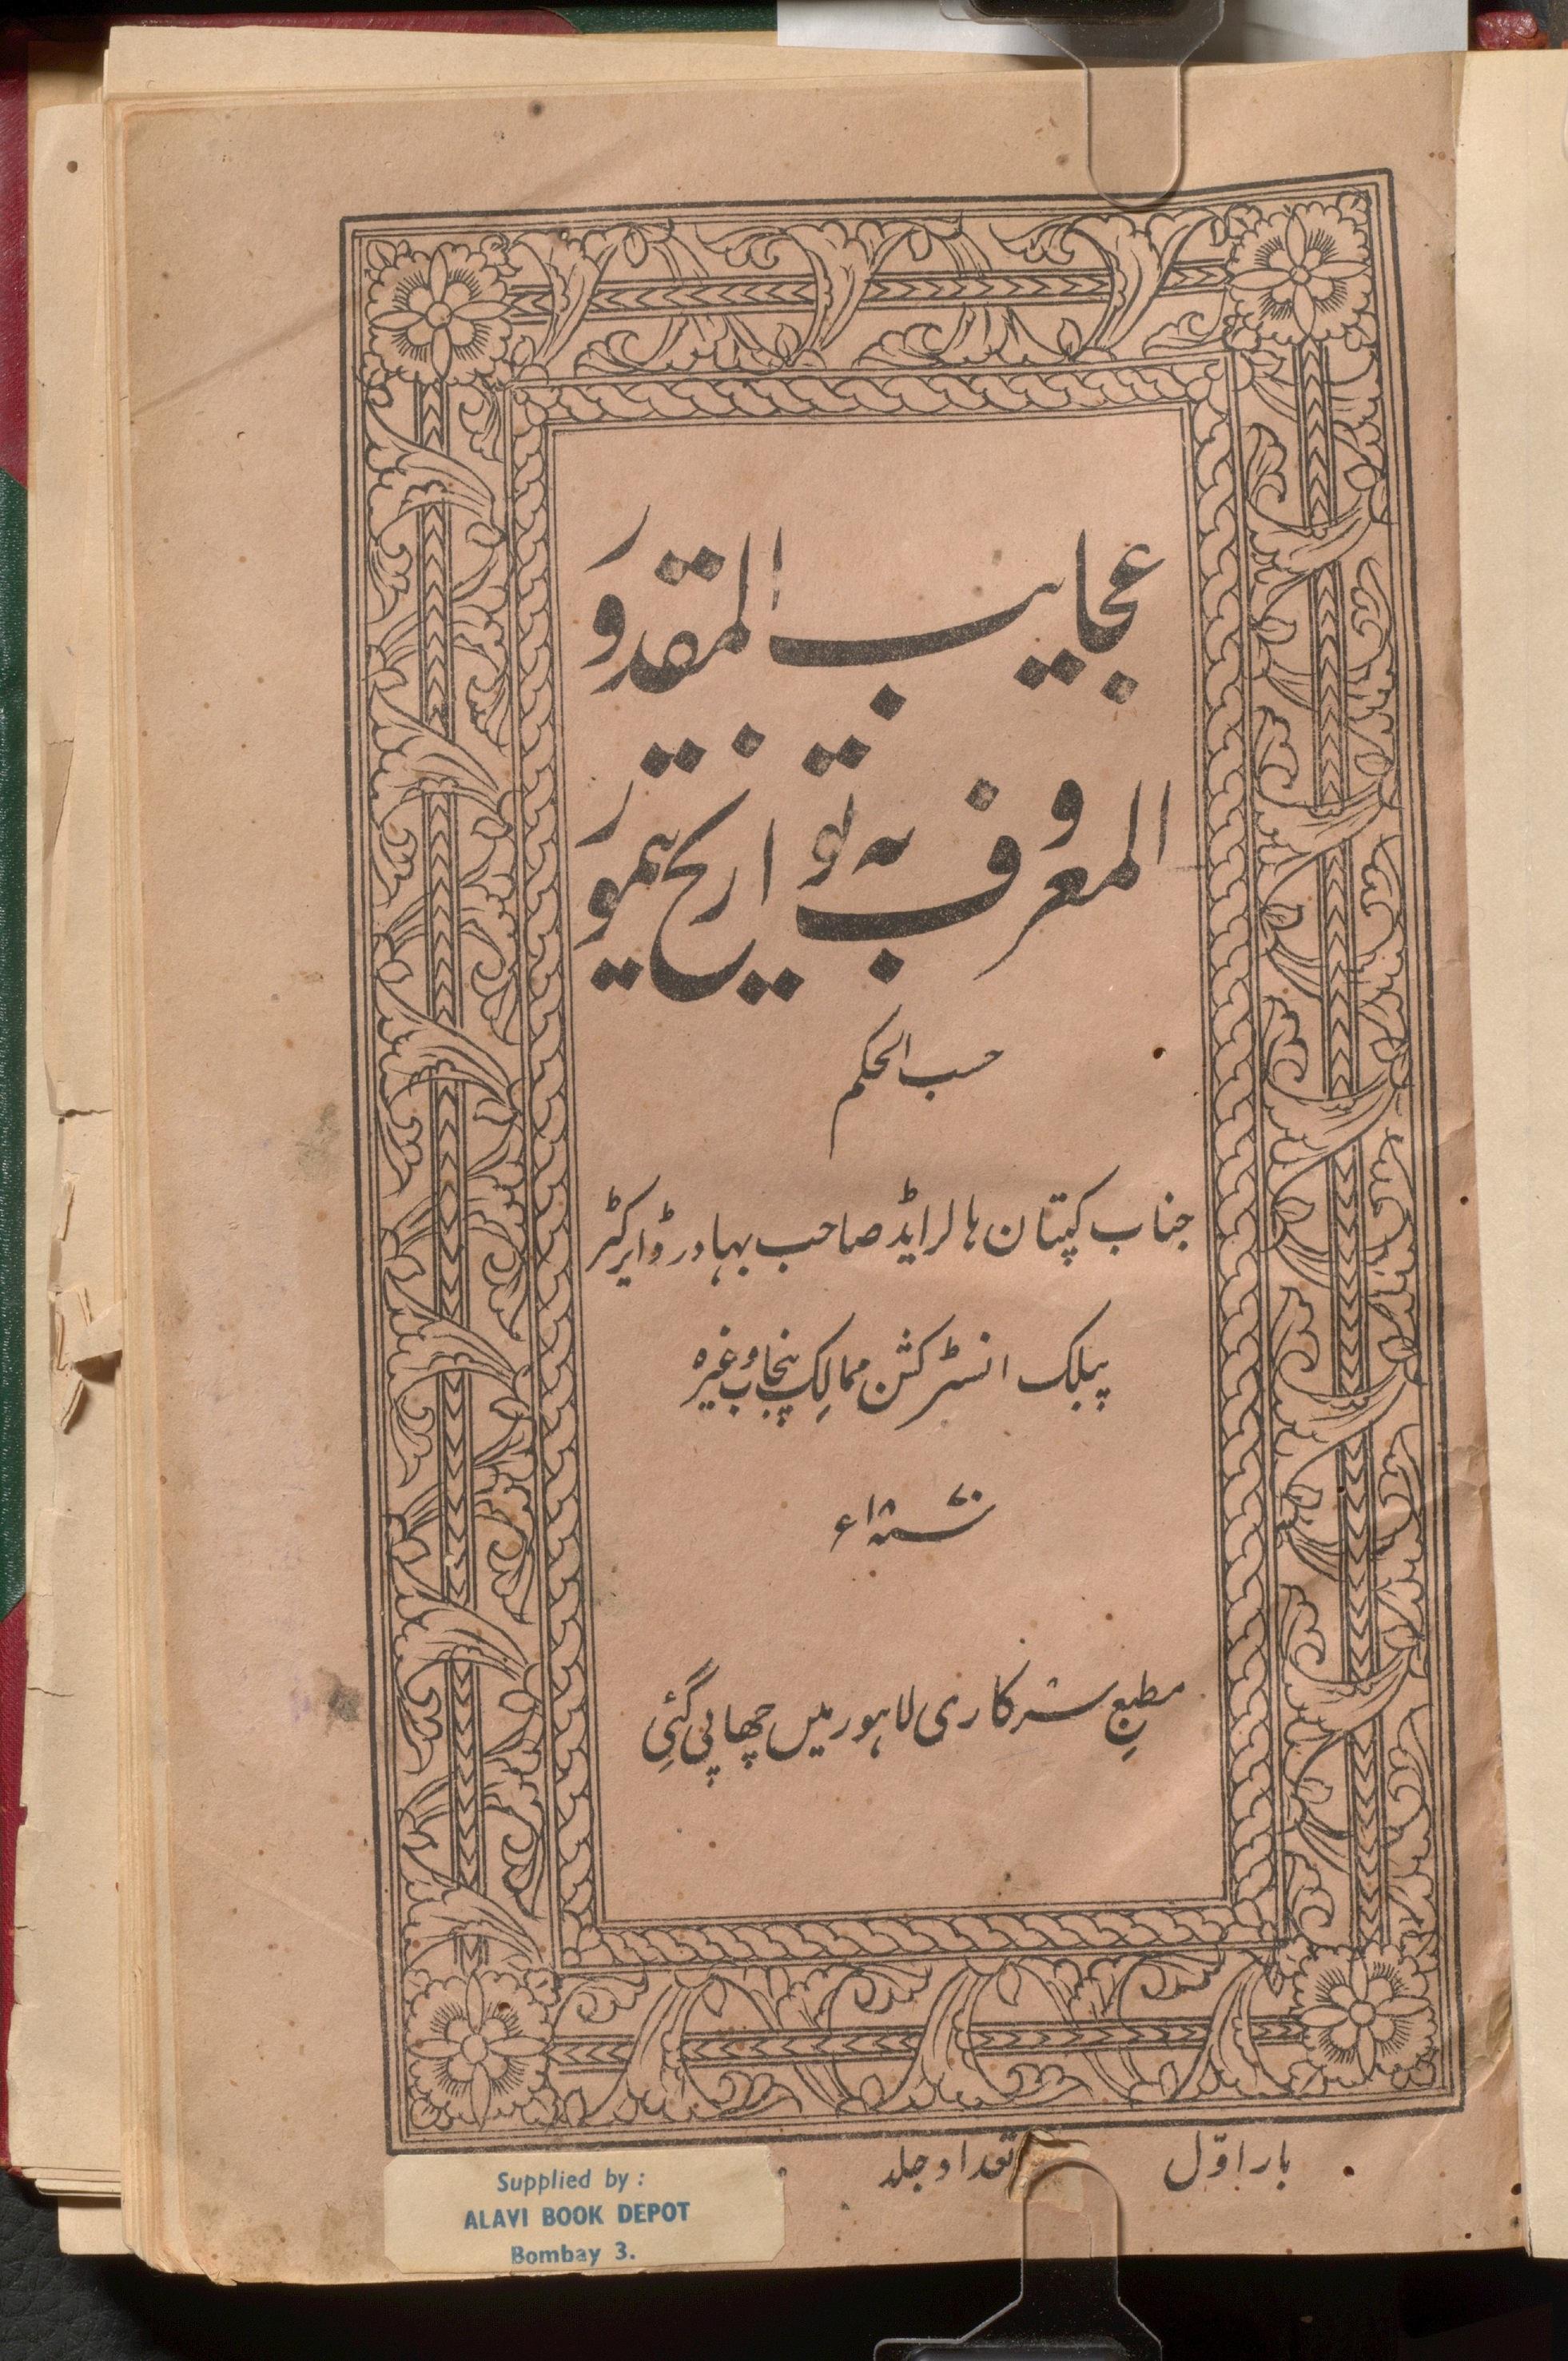 Ibn ʻArabshāh, Aḥmad ibn Muḥammad, 1392-1450. ʻAjāʾib al-maqdūr fī akhbār Tīmūr, al-maʻrūf bi-Taʾrīkh Tīmūr. Lāhūr : Maṭbaʻ Sarkārī, 1868.